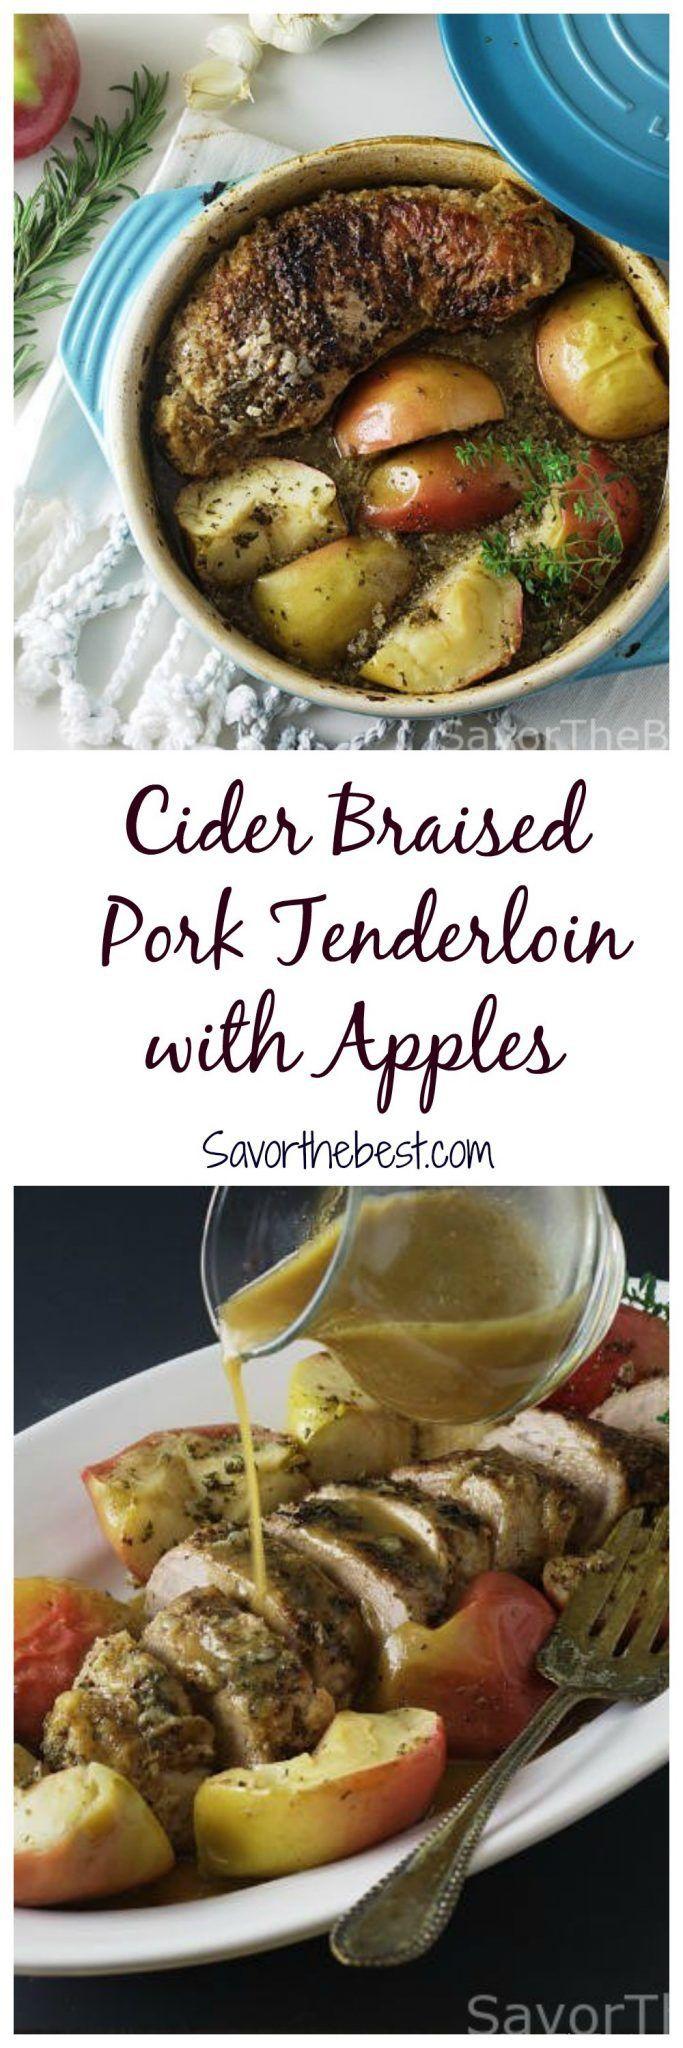 cider braised pork tenderloin with apples